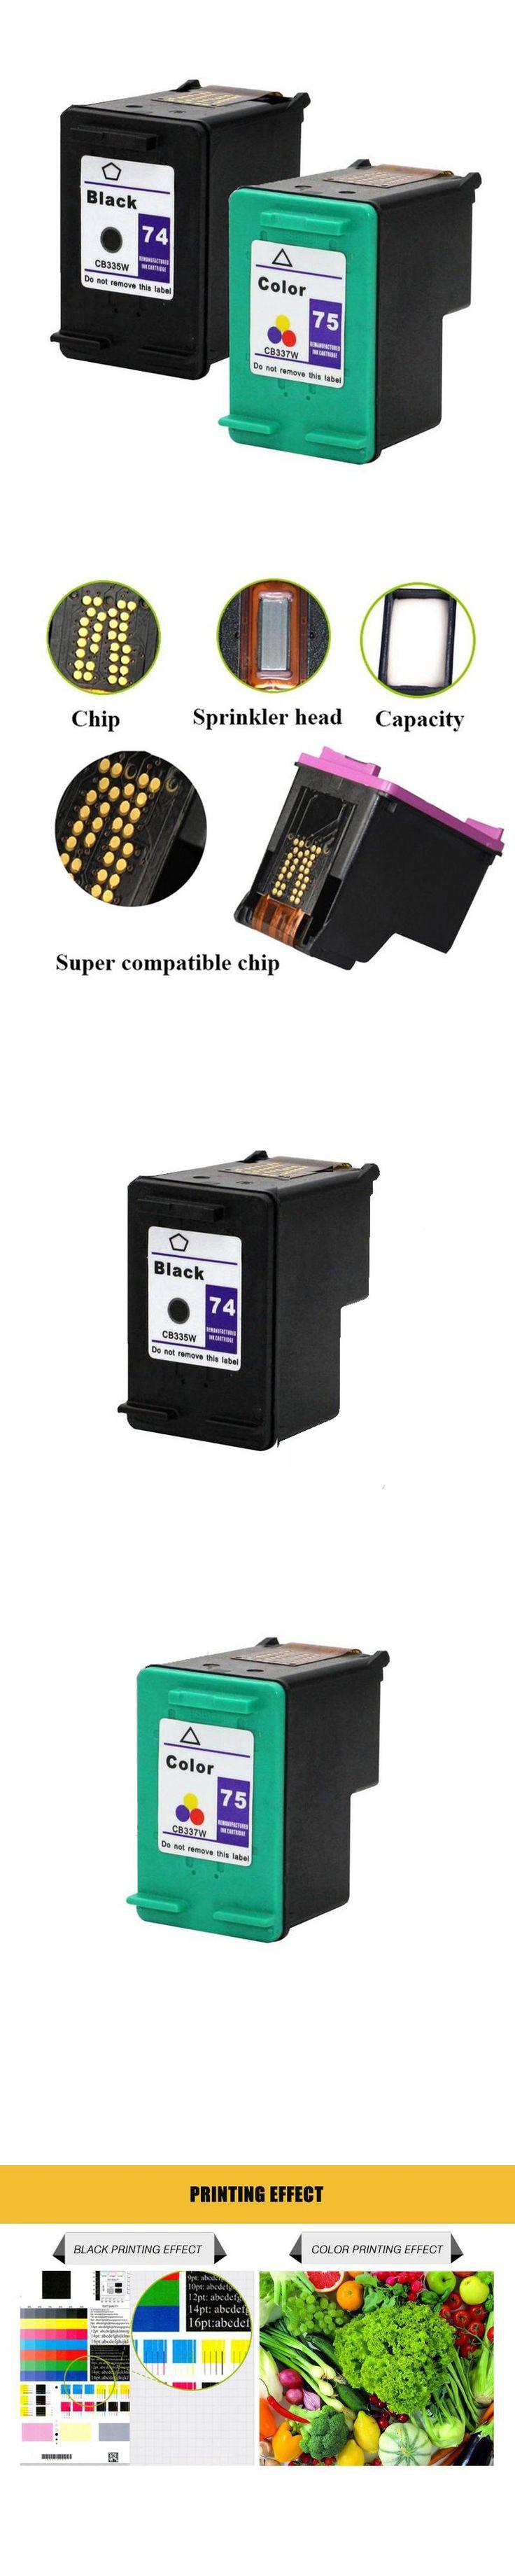 For HP 74 75 Ink Cartridge for HP74 75 smart C4200 C4280 C4480 C4345 C4380 C4385